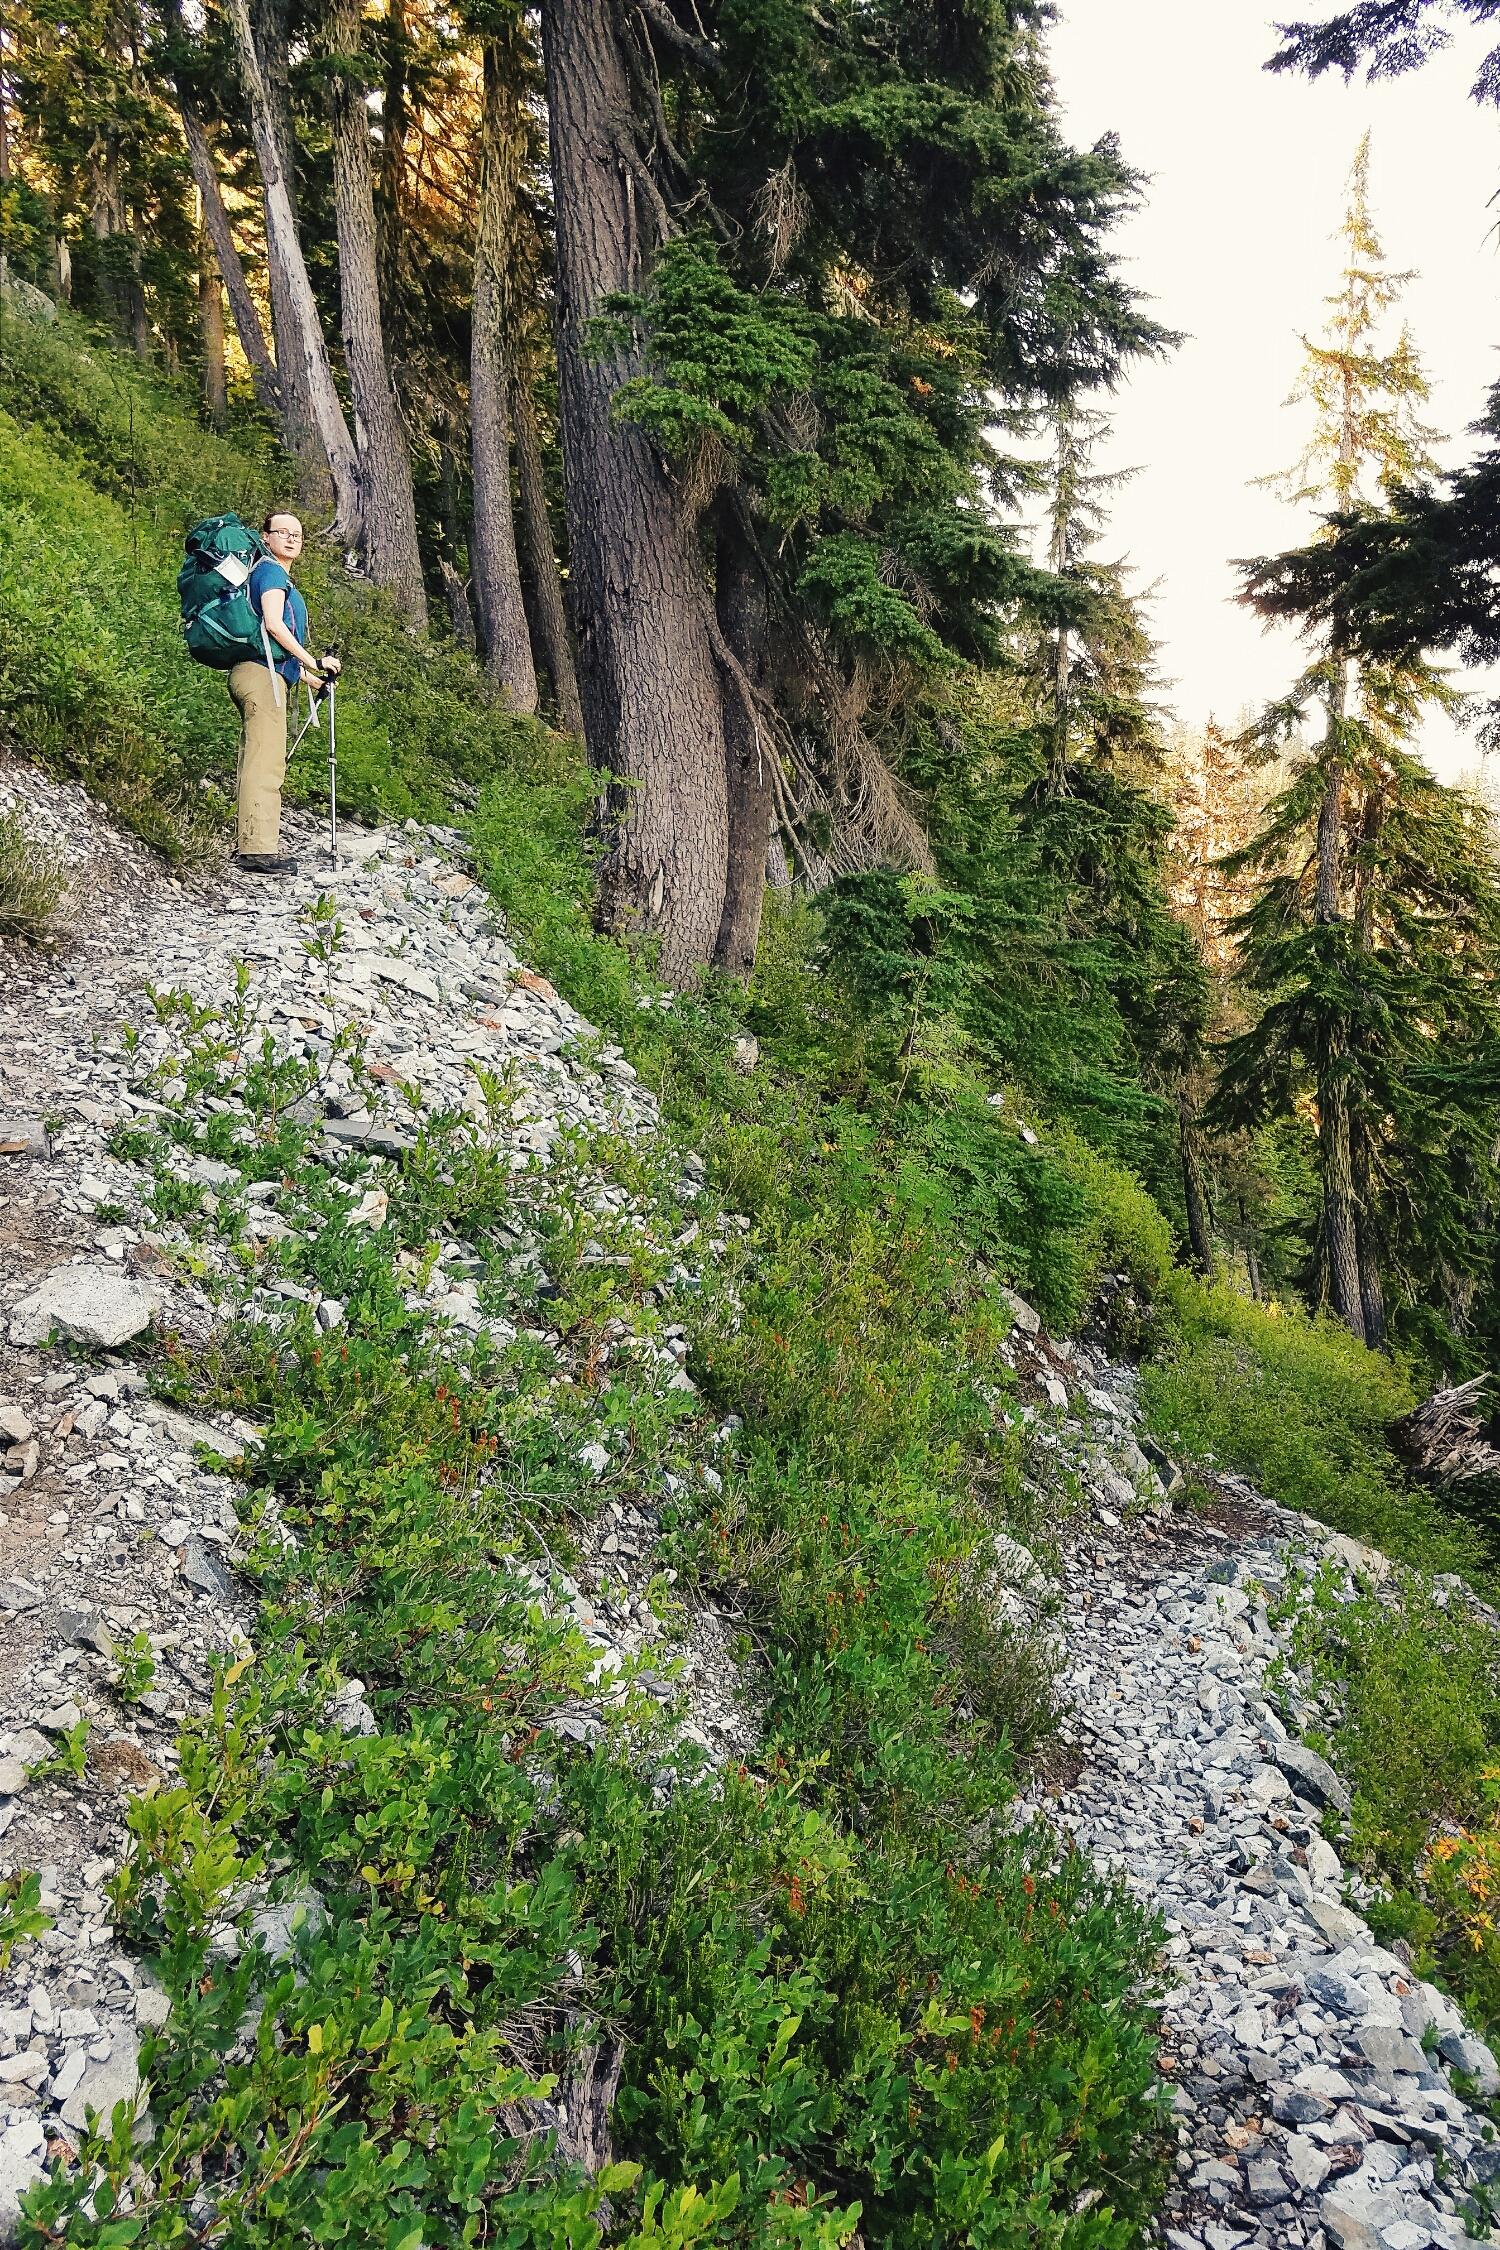 STEEP switchbacks to start the hike home